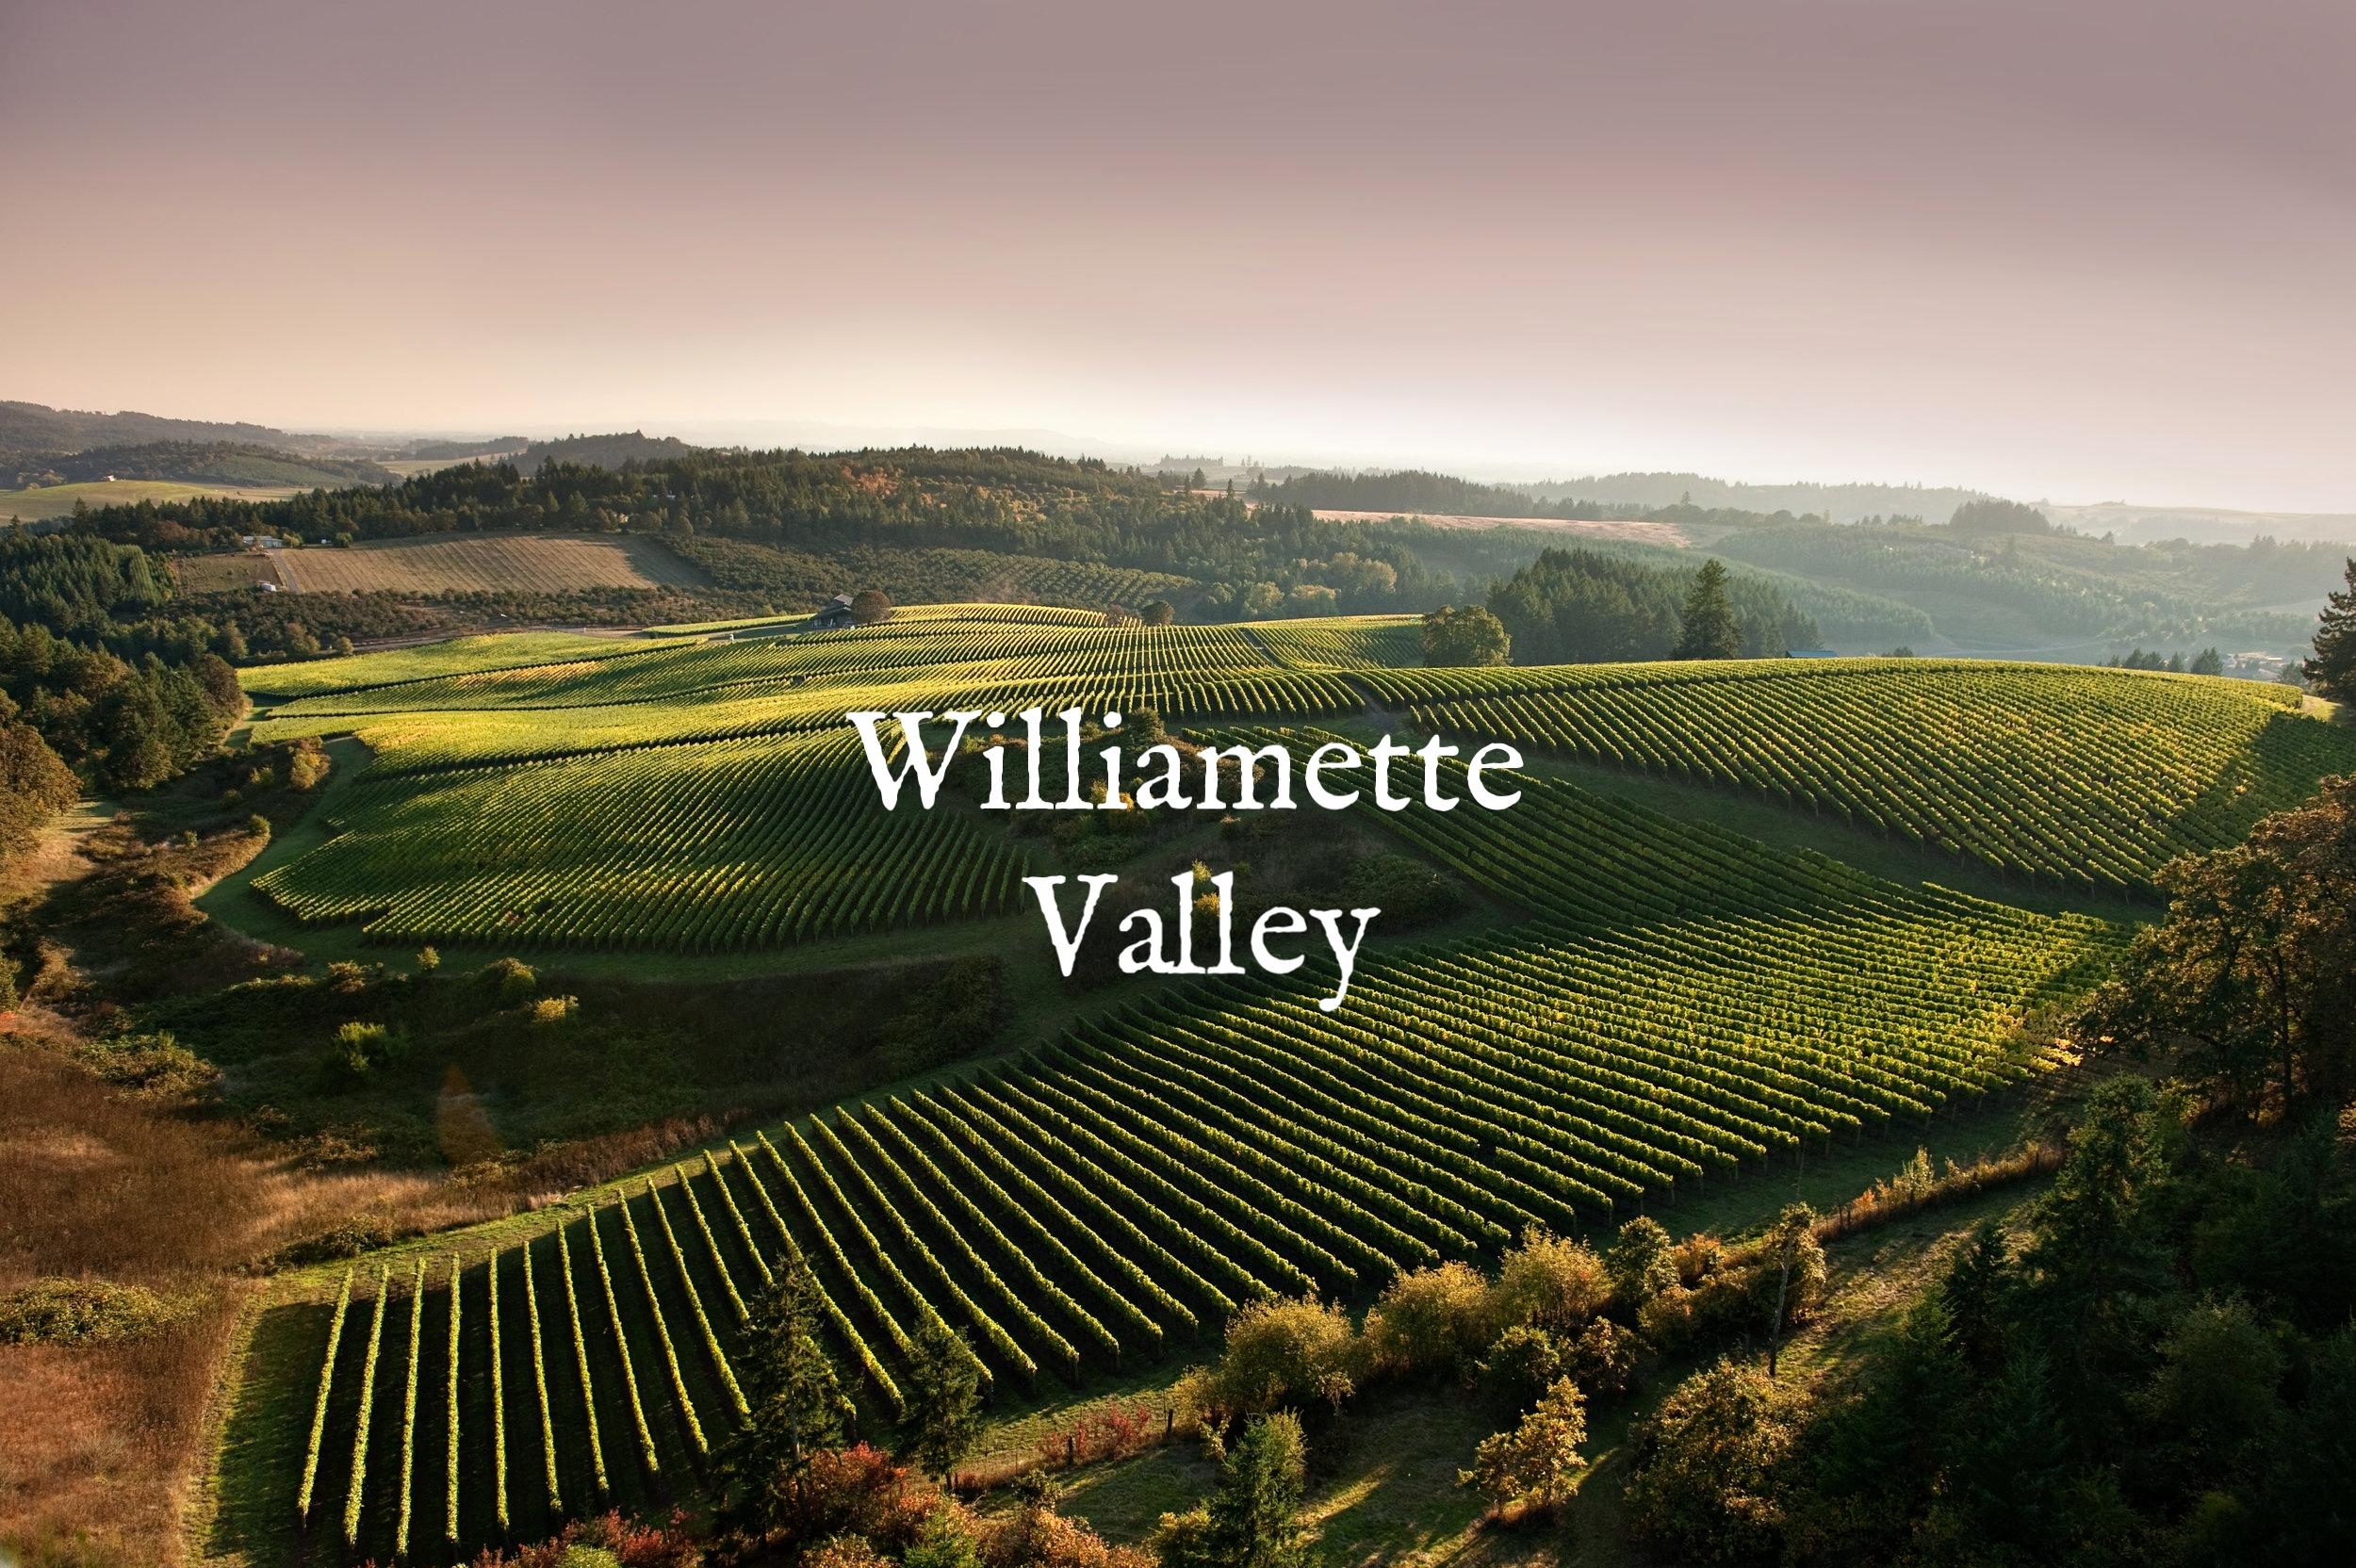 WillametteValley.jpg